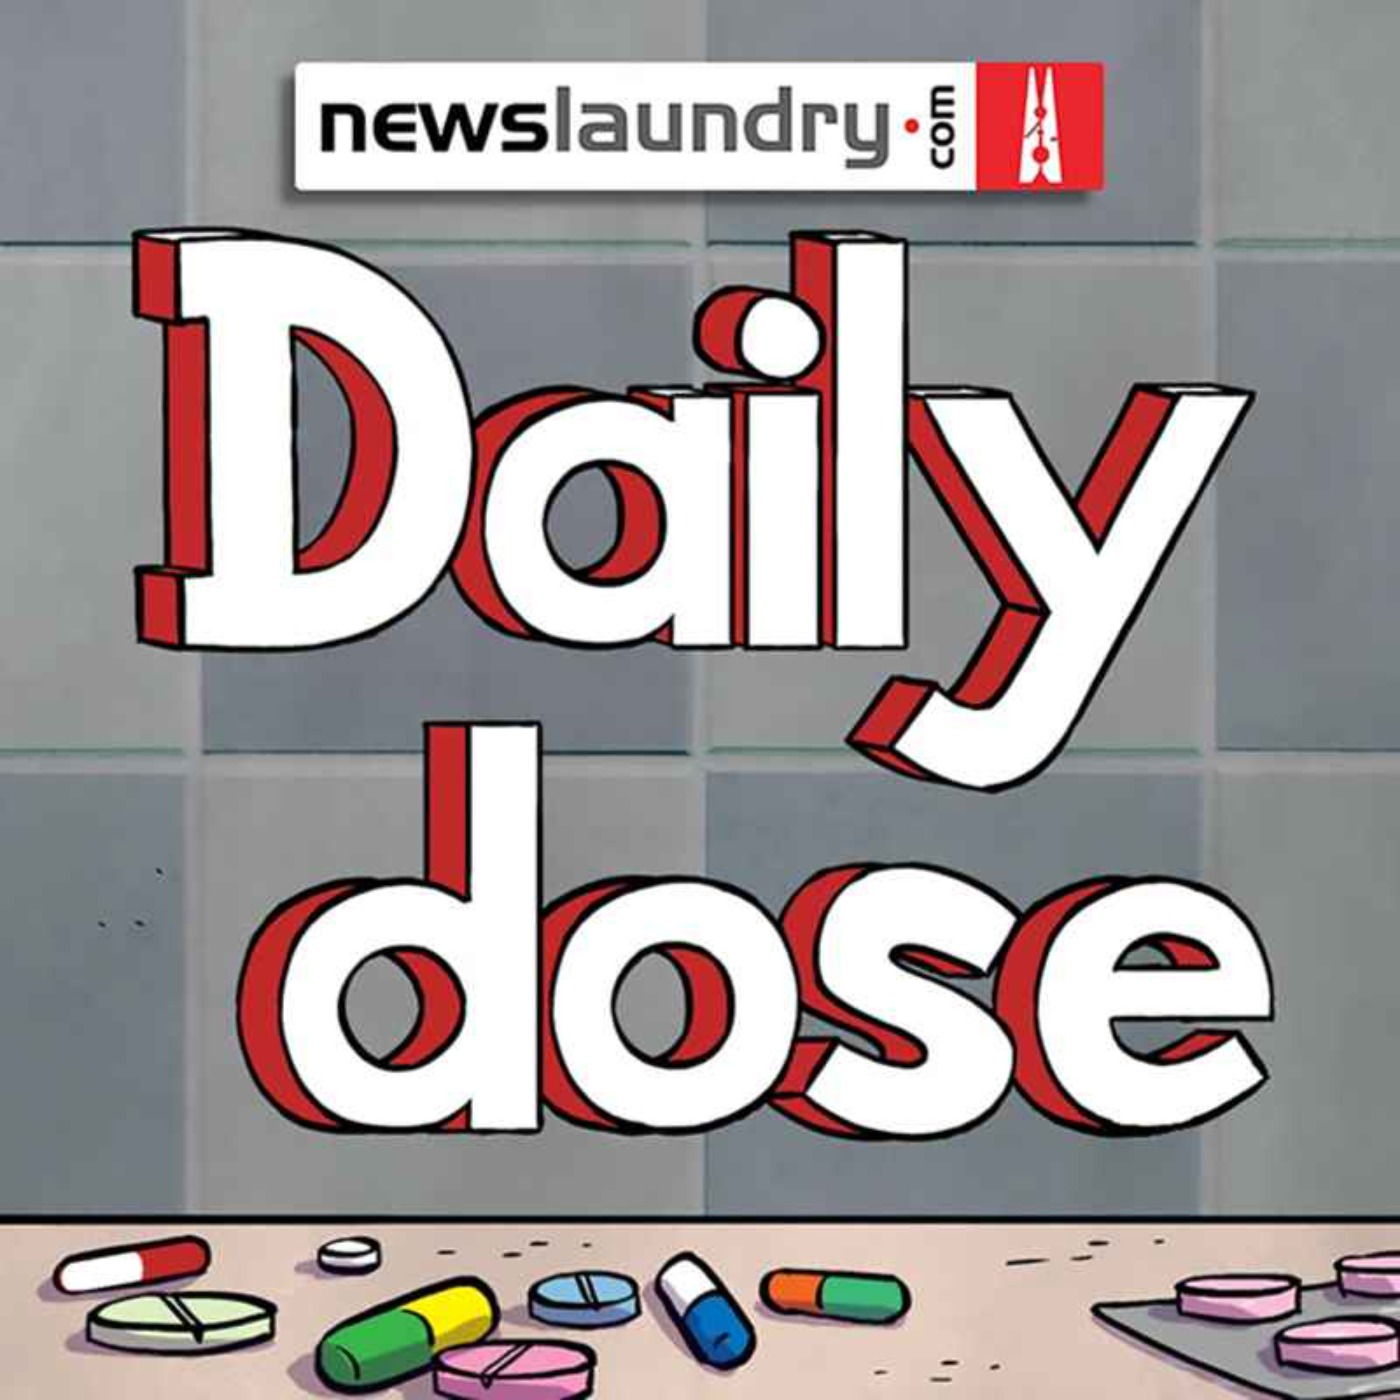 Daily Dose Ep 725: Covid disaster, Cyclone Tauktae, Uttar Pradesh prison shootout